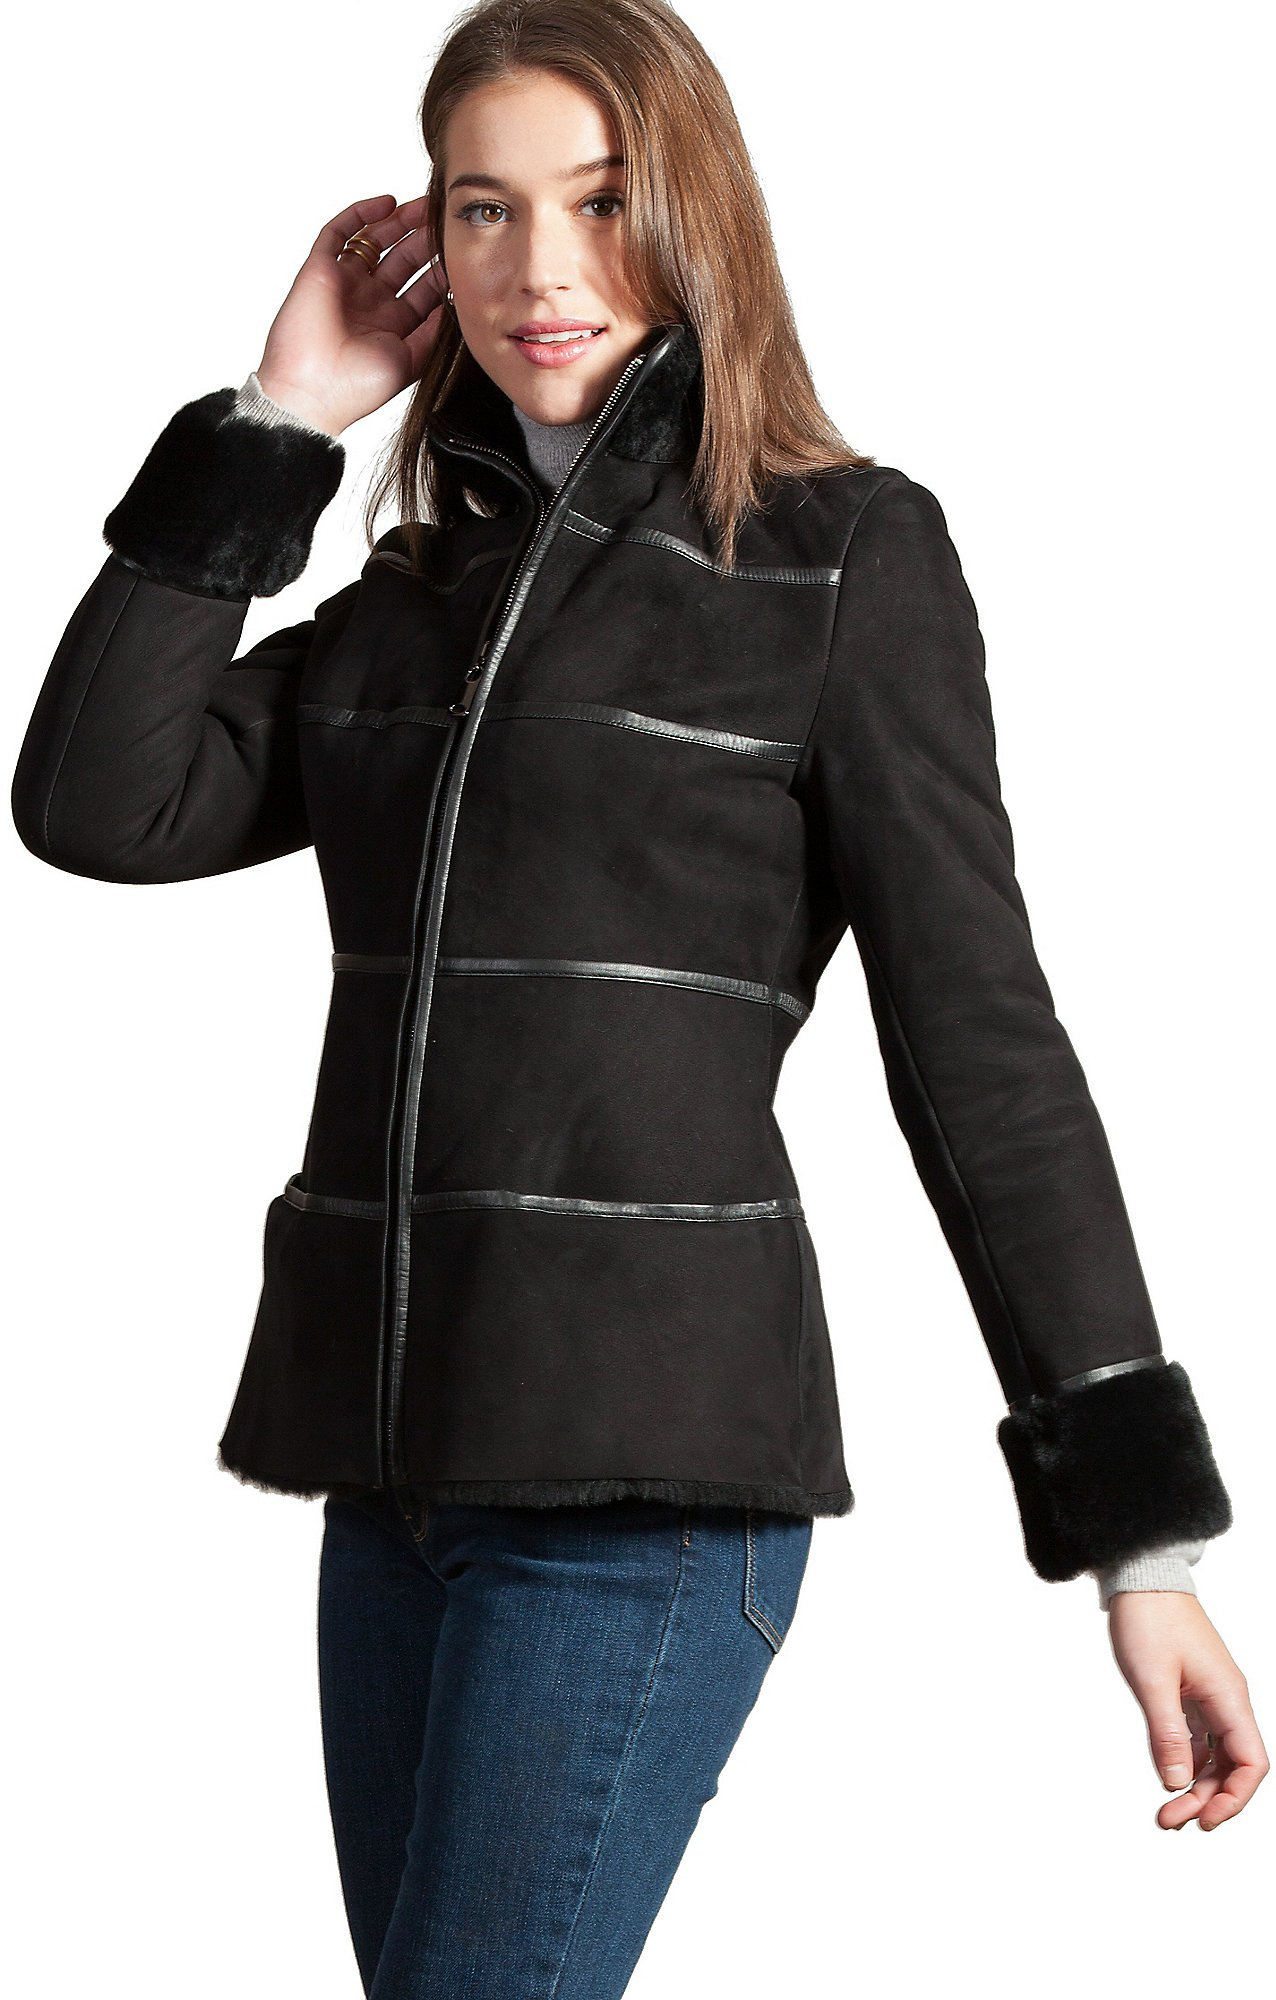 Jordan Spanish Shearling Sheepskin Coat, Black, Size Medium (6) by Overland Sheepskin Co